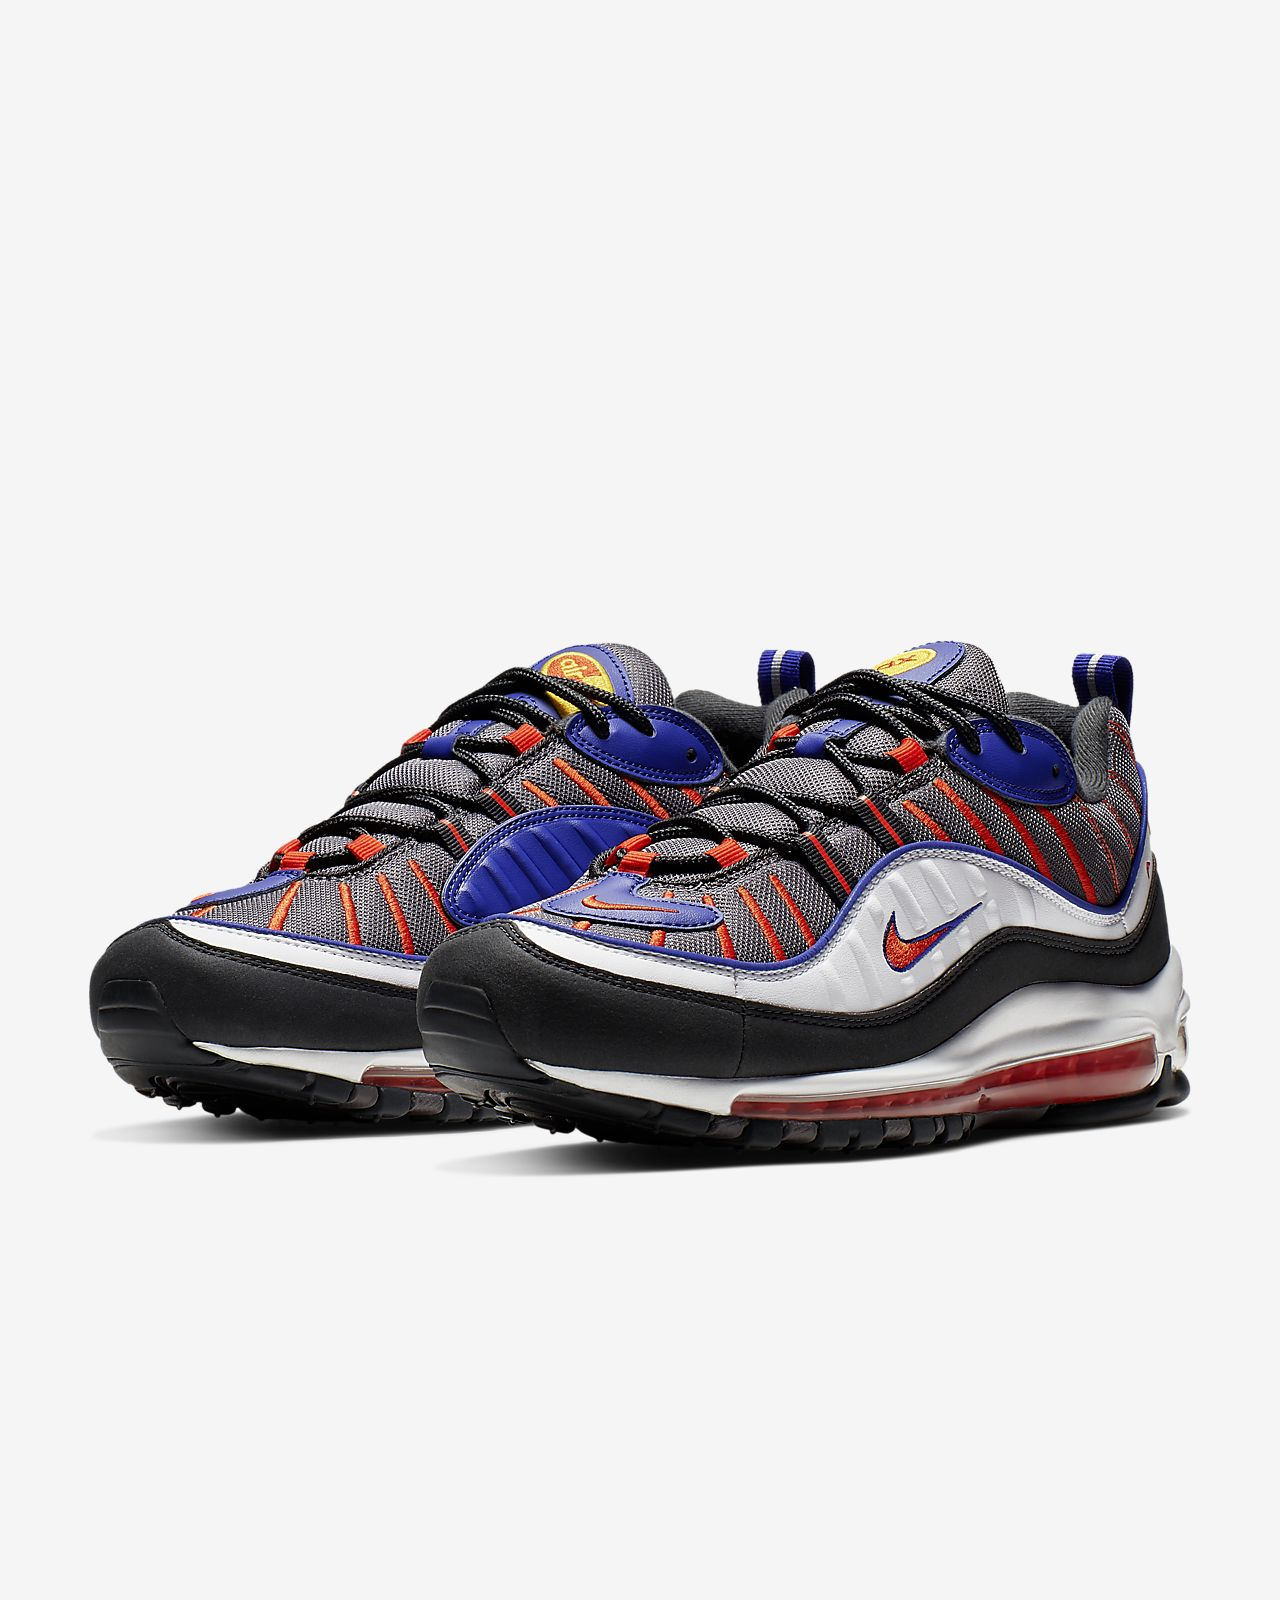 premium selection 9a14a c6417 ... Nike Air Max 98 Men s Shoe